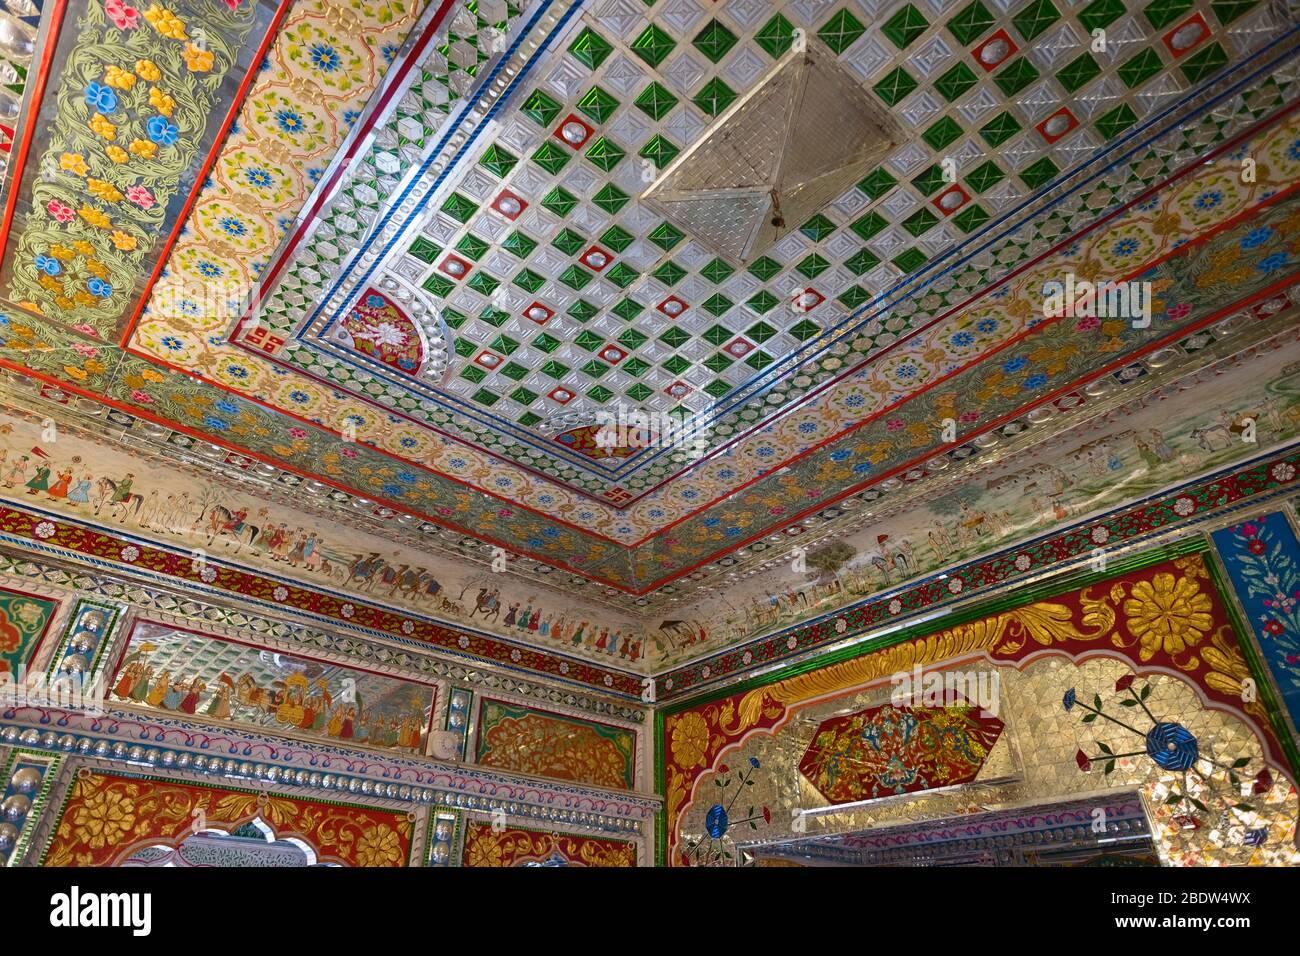 Patwa-ki-Haveli décoration intérieure Jaisalmer Rajasthan Inde Banque D'Images